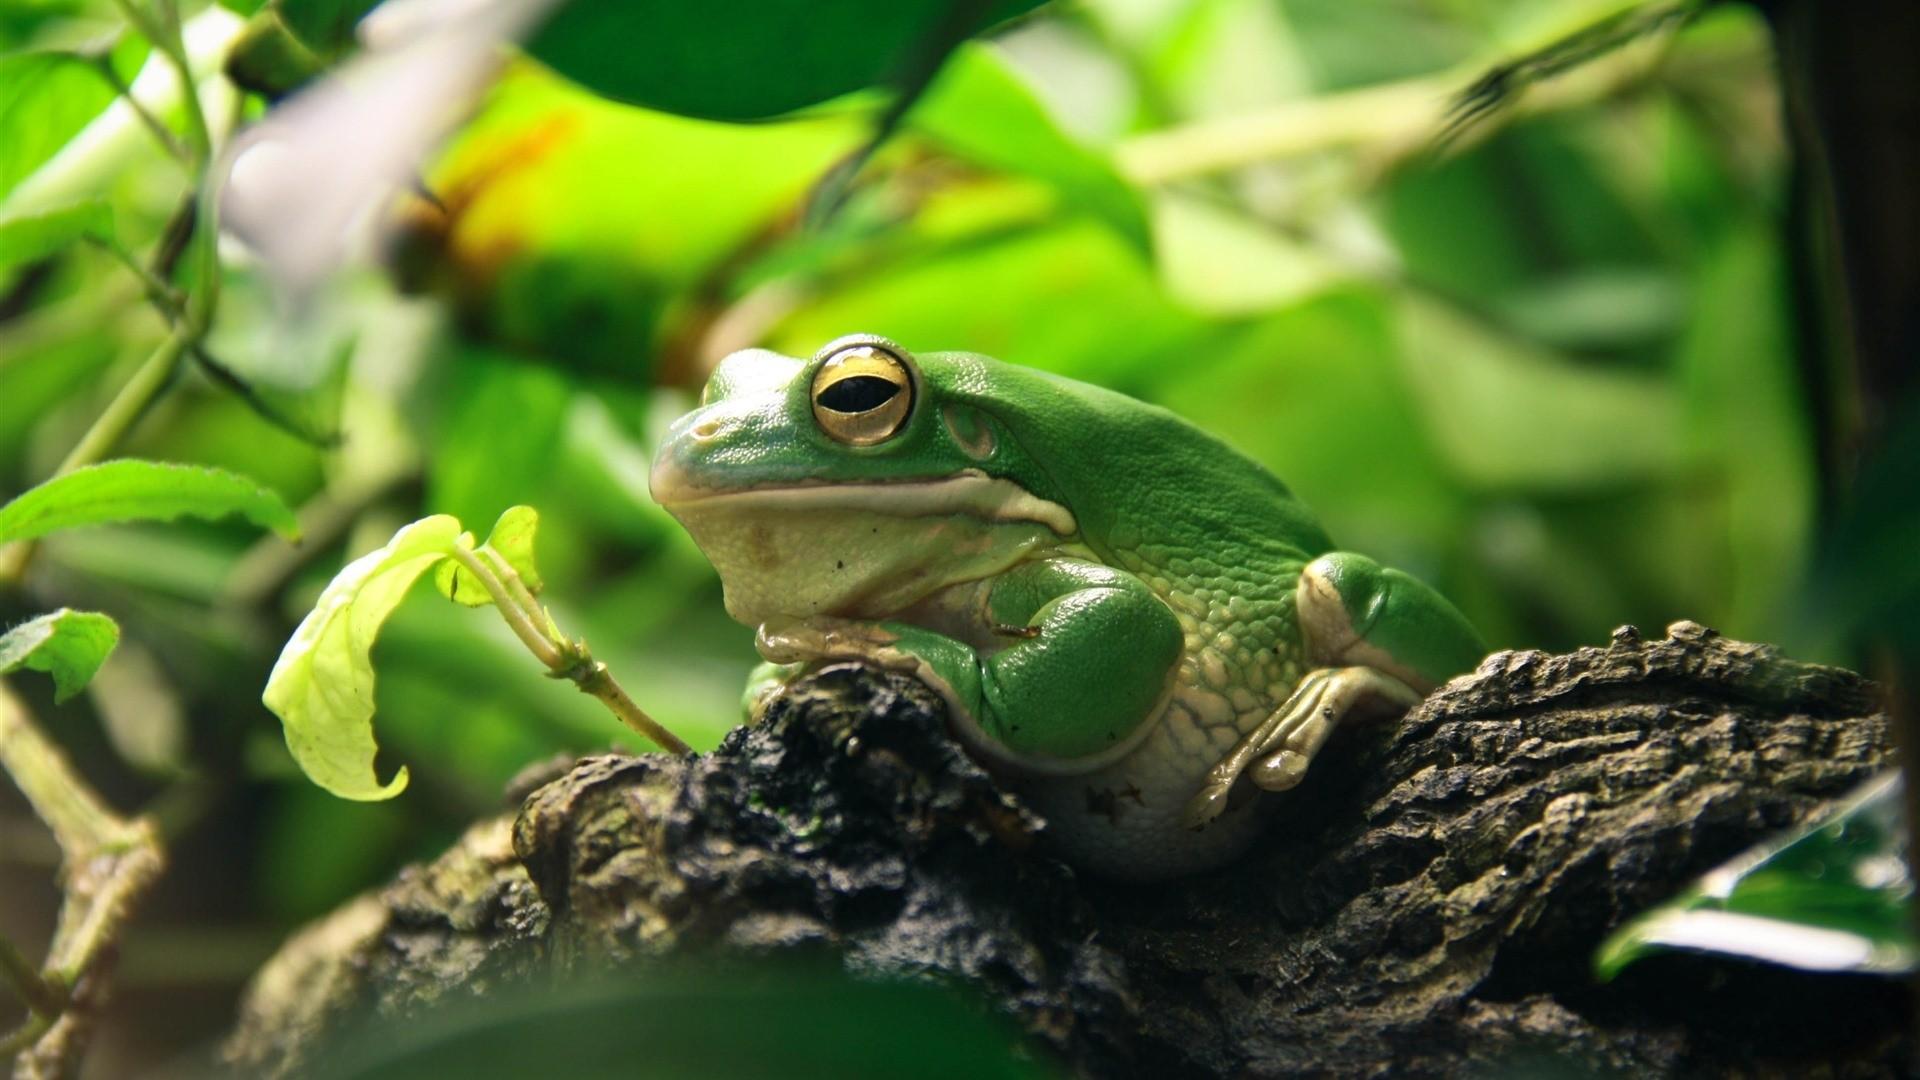 Frog wallpaper photo hd